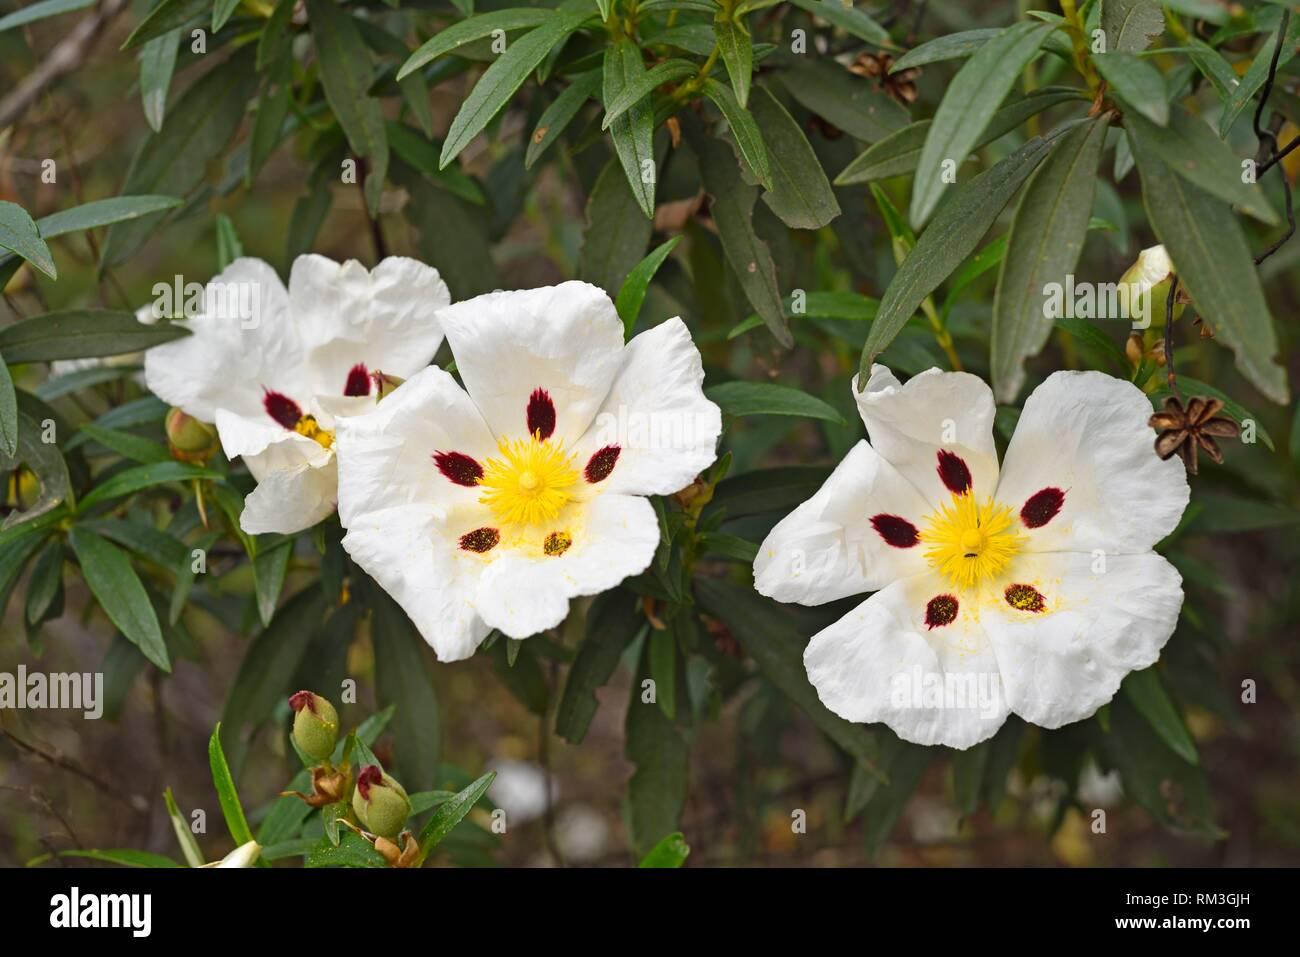 blooming gum rockrose (Cistus ladanifer), Alentejo region, Portugal, southwertern Europe. - Stock Image